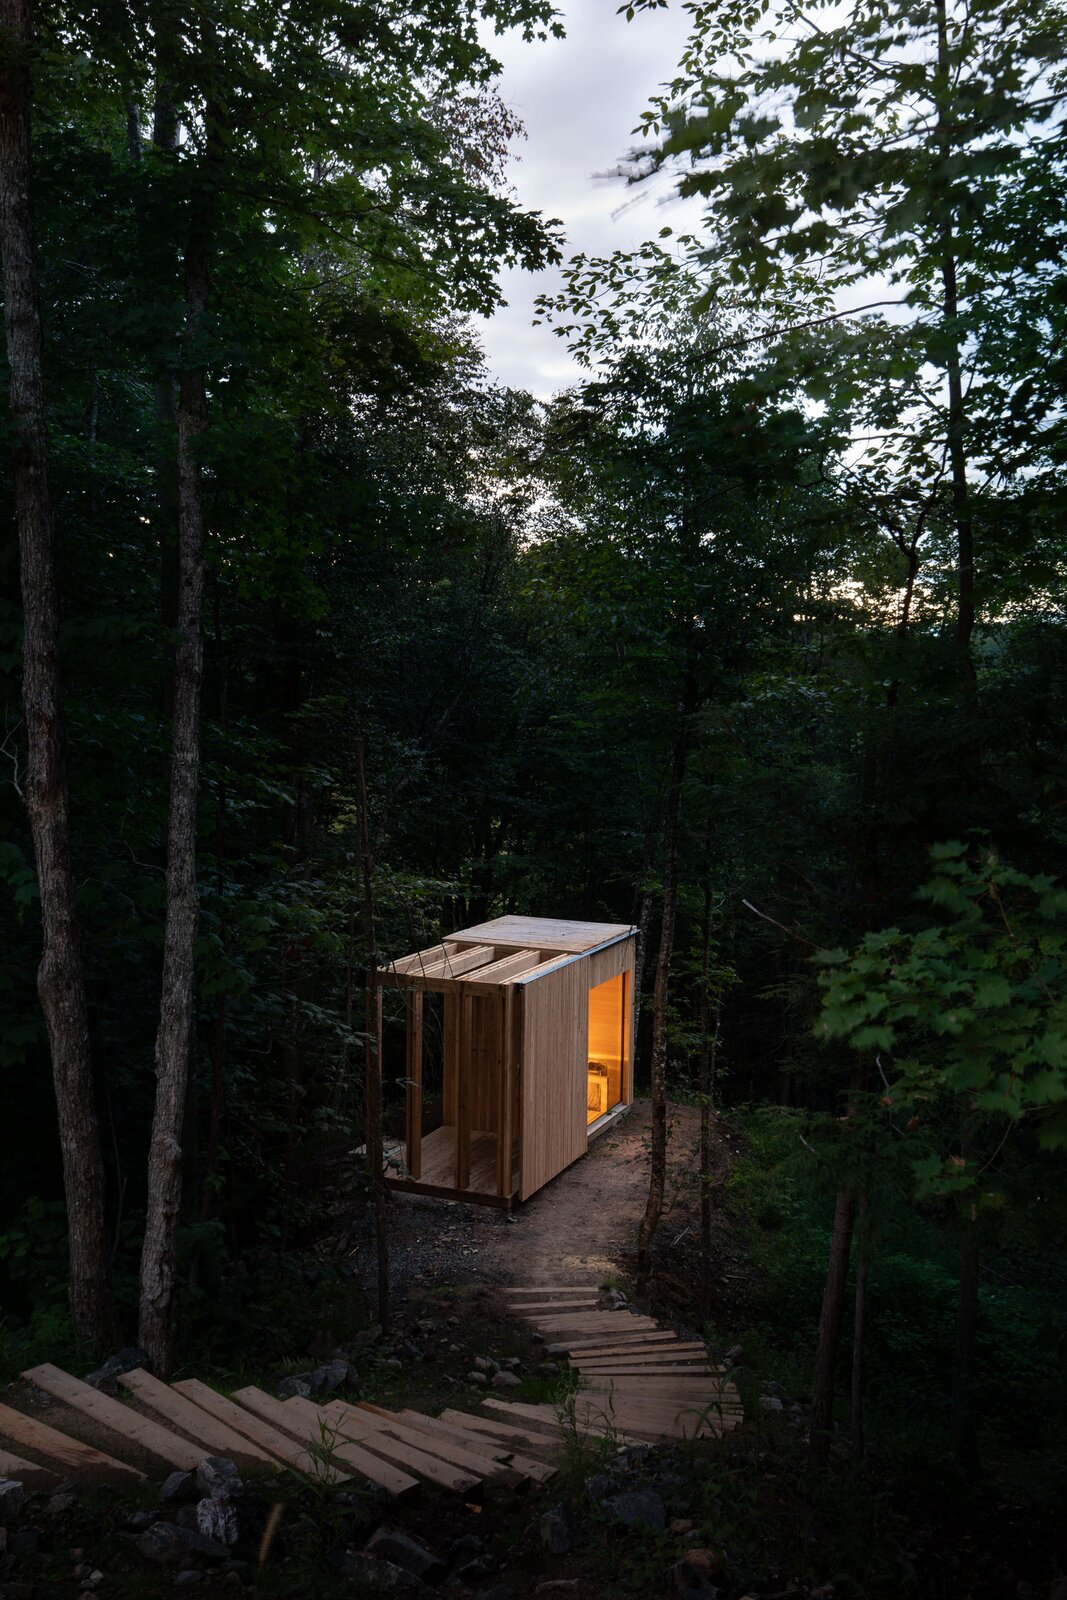 Hinterhouse sauna